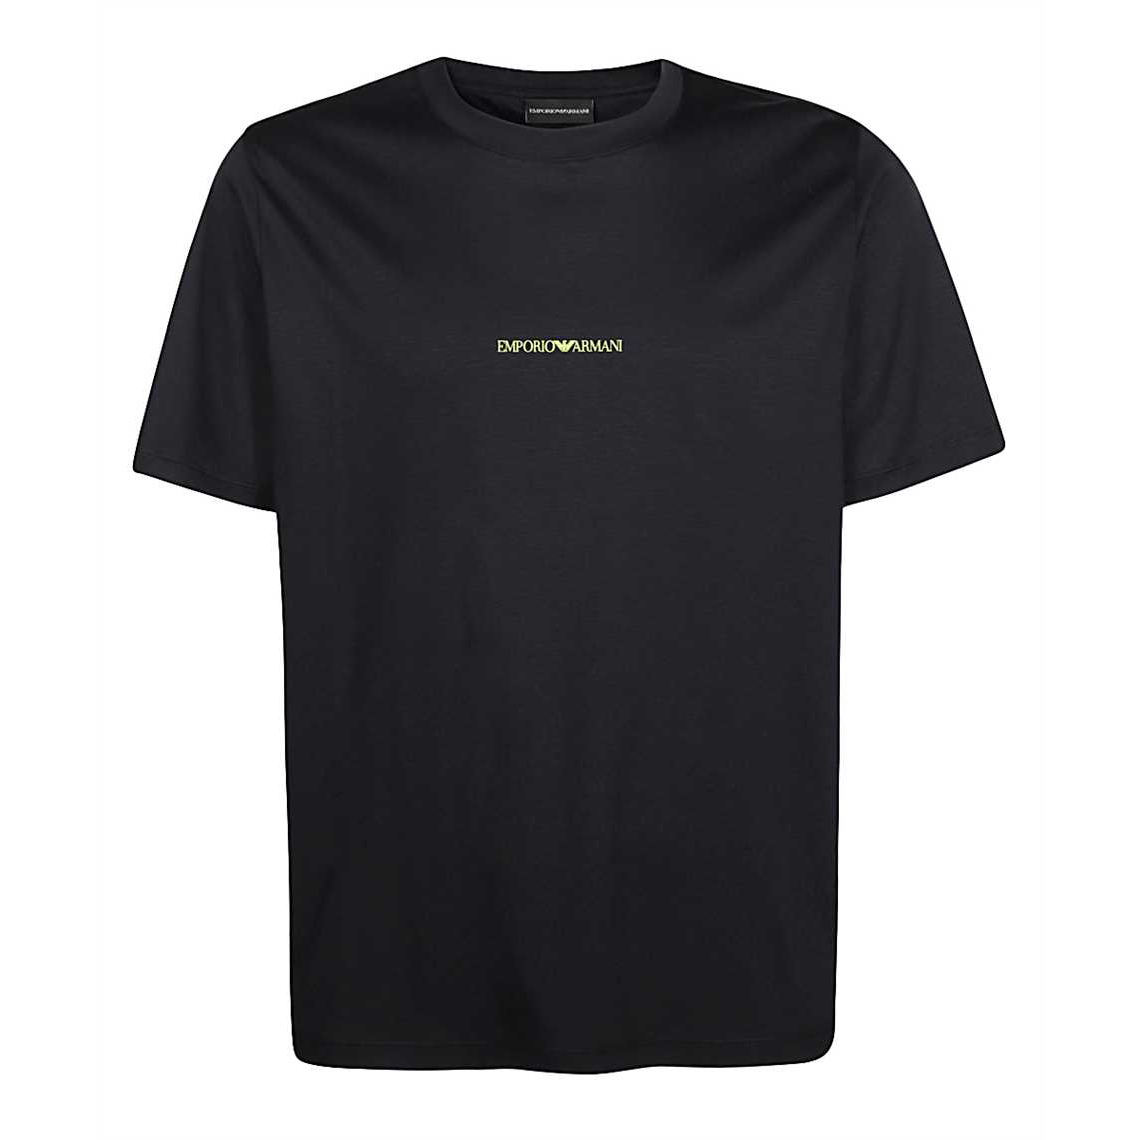 تیشرت آستین کوتاه مردانه امپریو آرمانی مدل 3H1T781JSTZ-0922 -  - 2